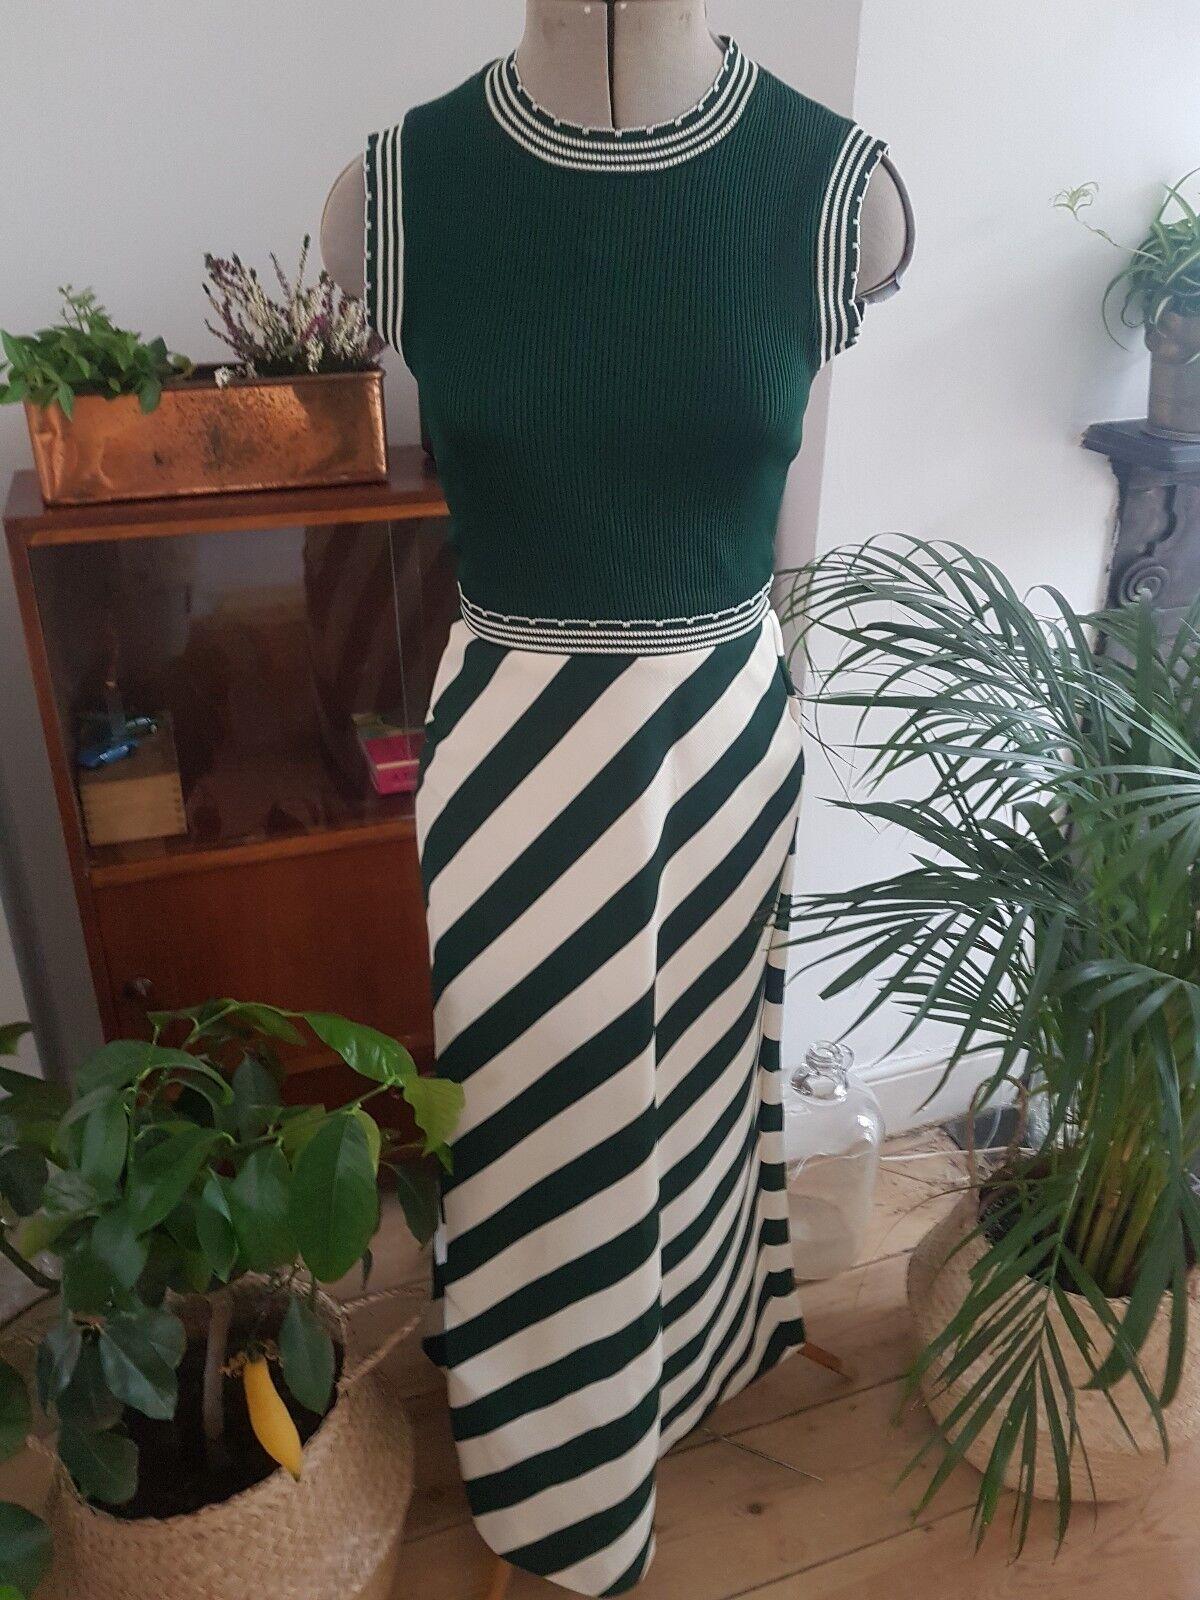 Vintage MOD JONATHAN LOGAN Boho knitted GREEN WHITE MAXI DRESS SIZE XS S 6 8